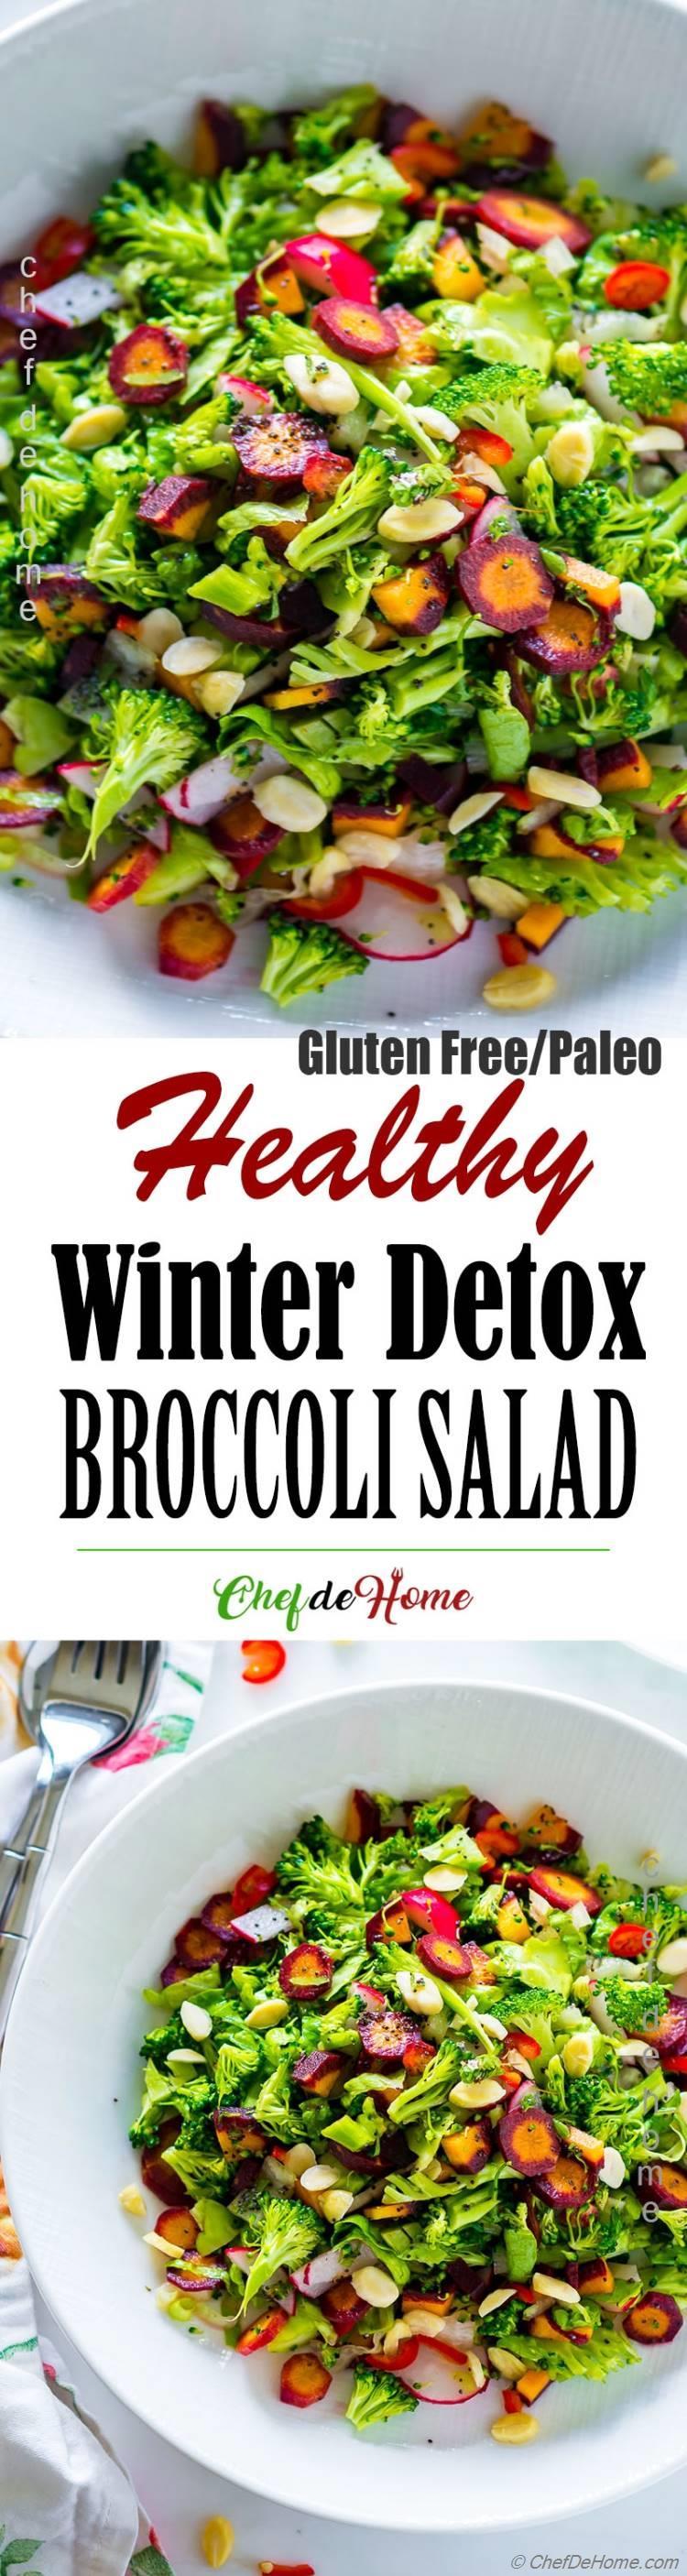 Winter Detox Raw Broccoli Salad